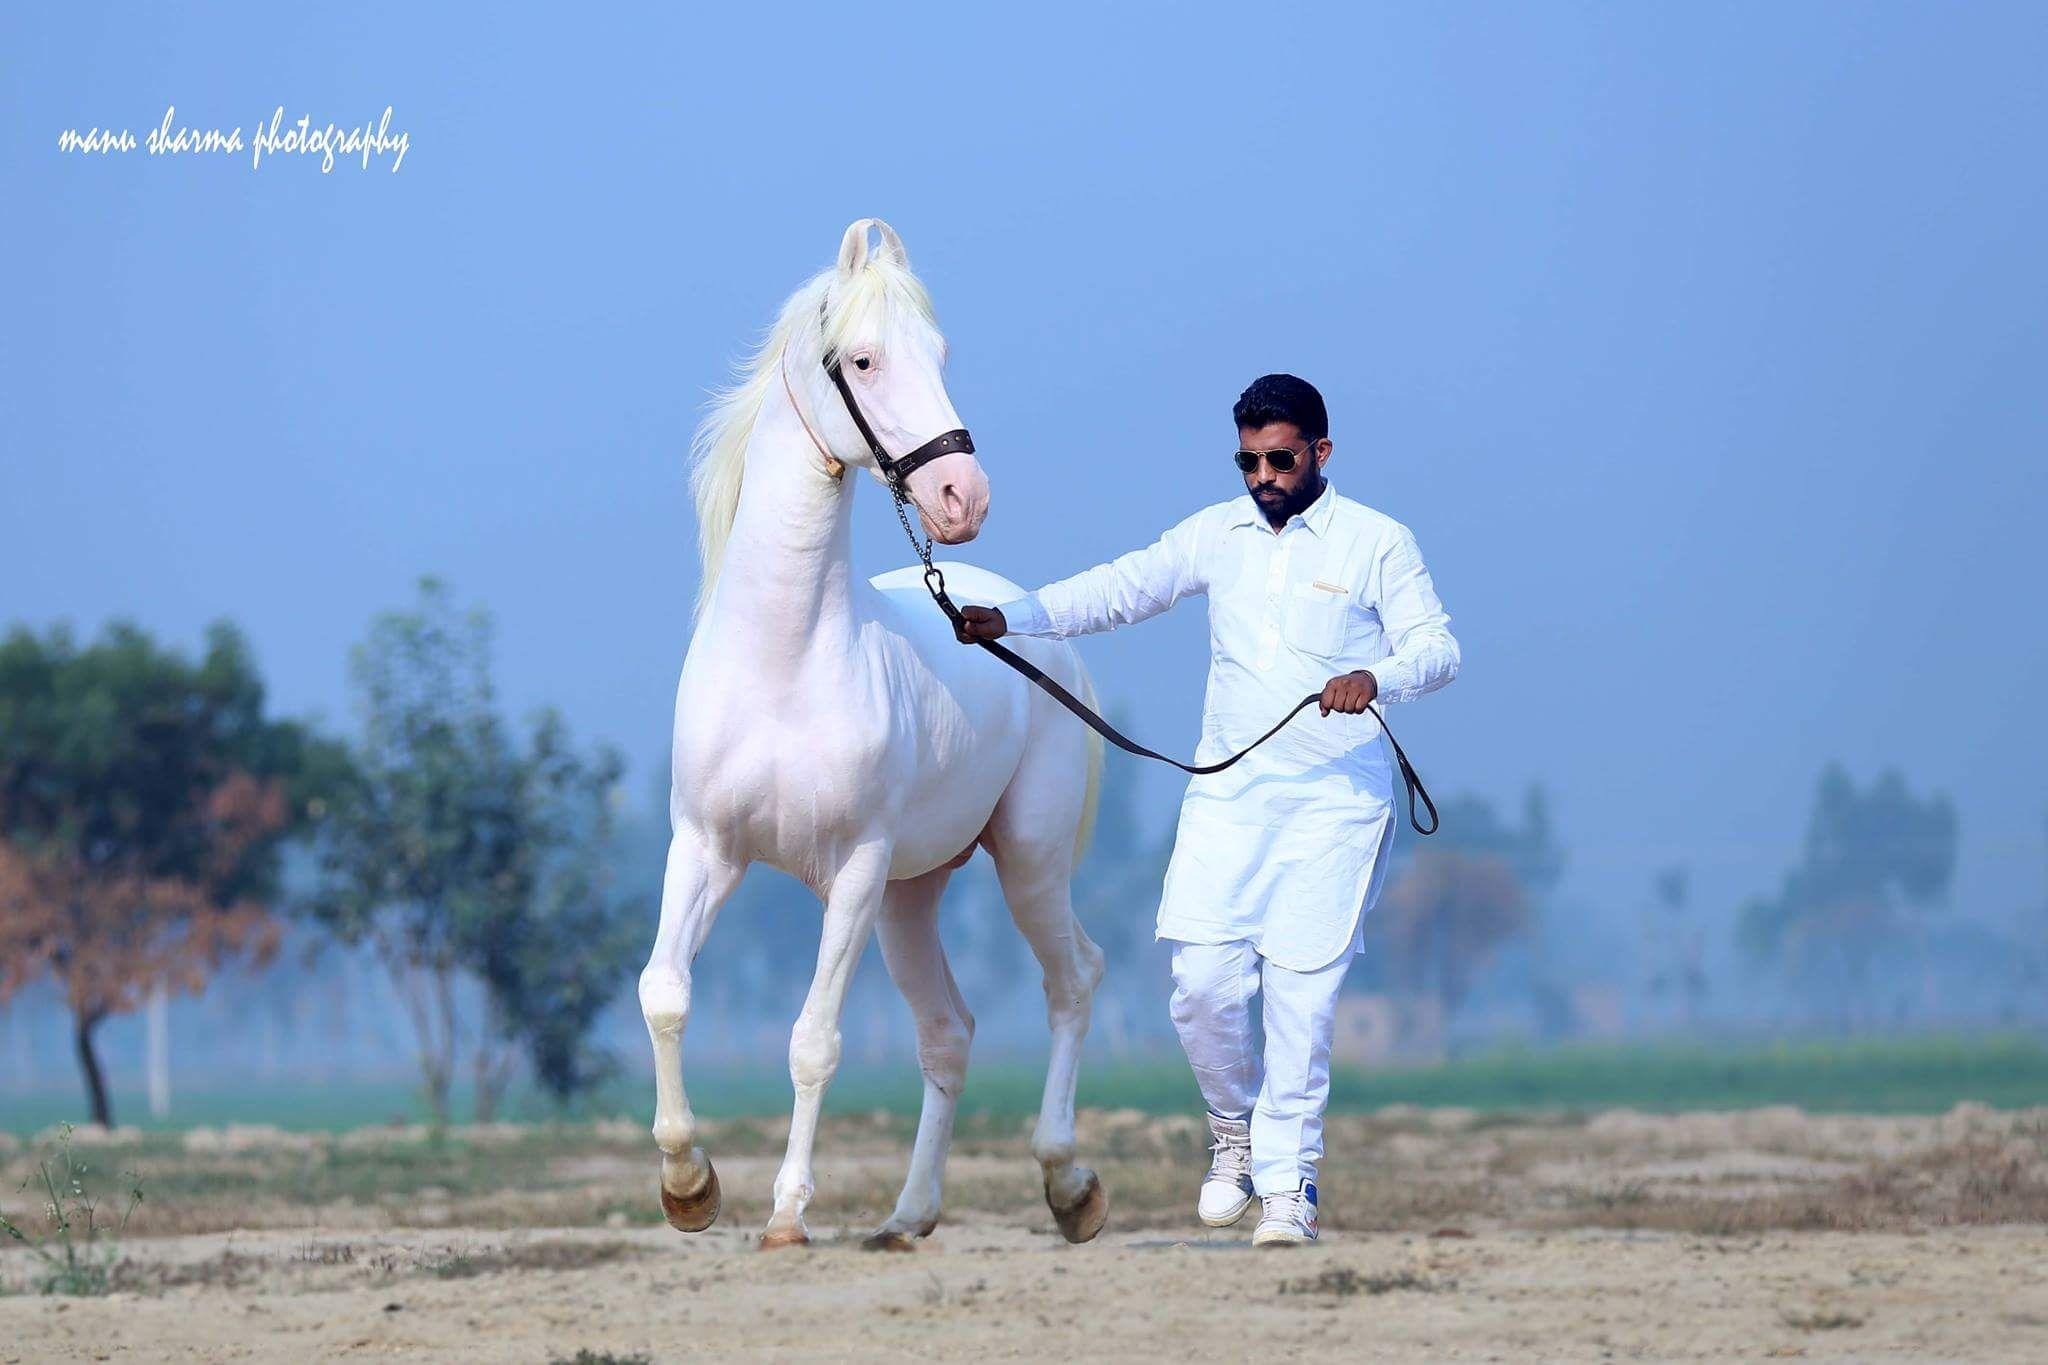 Stallion Prince Owner Sandhu Stud Farm Dod Punjab India C Manu Sharma Photography 2017 Marwari Horses Equine Photographer Animals Wild [ 1365 x 2048 Pixel ]